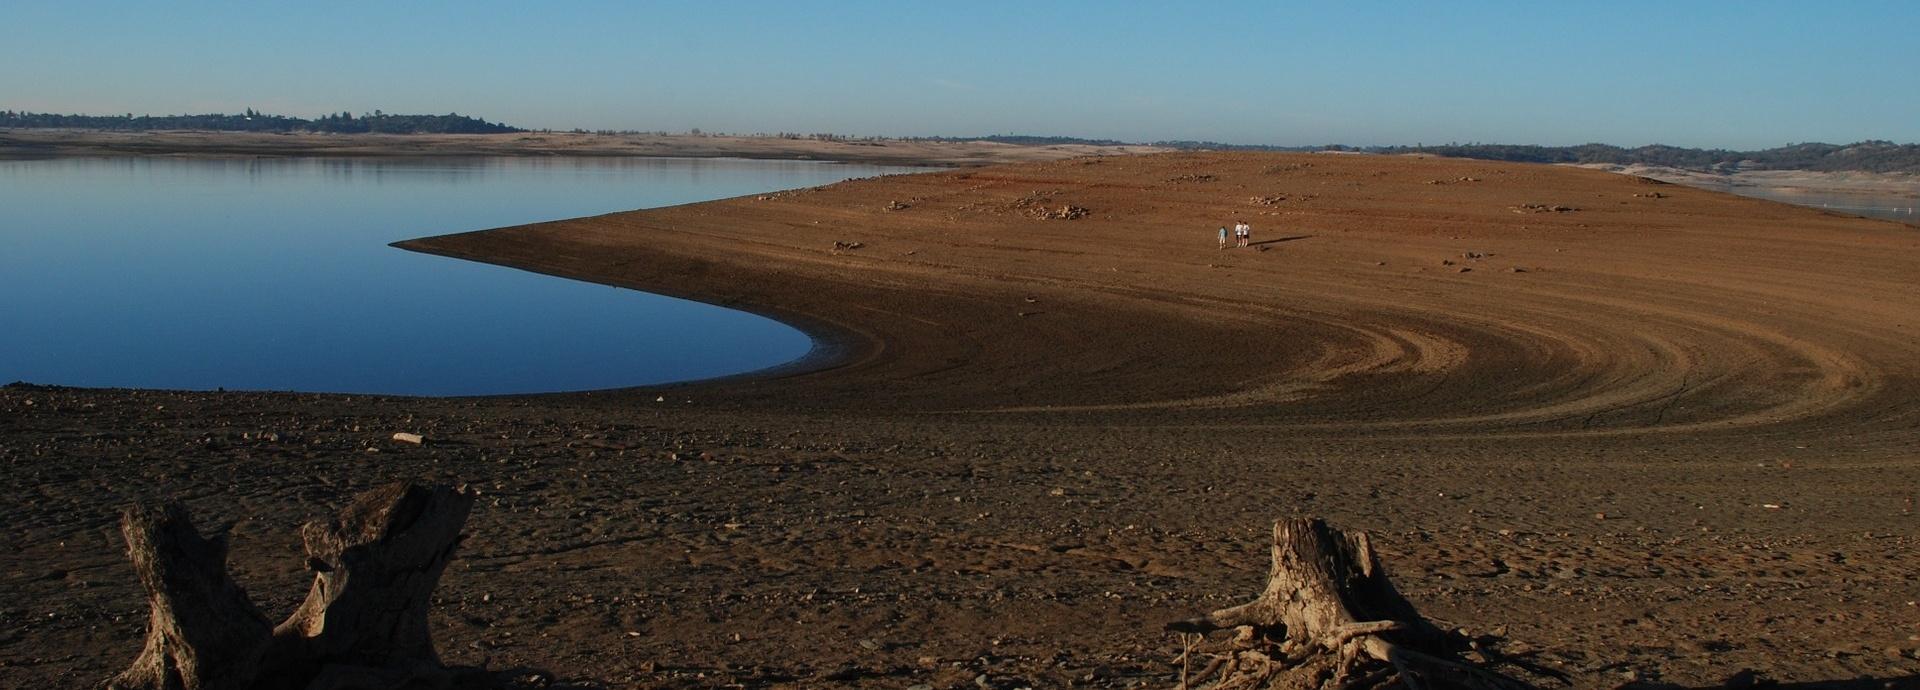 drought-california-water-energy-pixabay-079866-edited.jpg